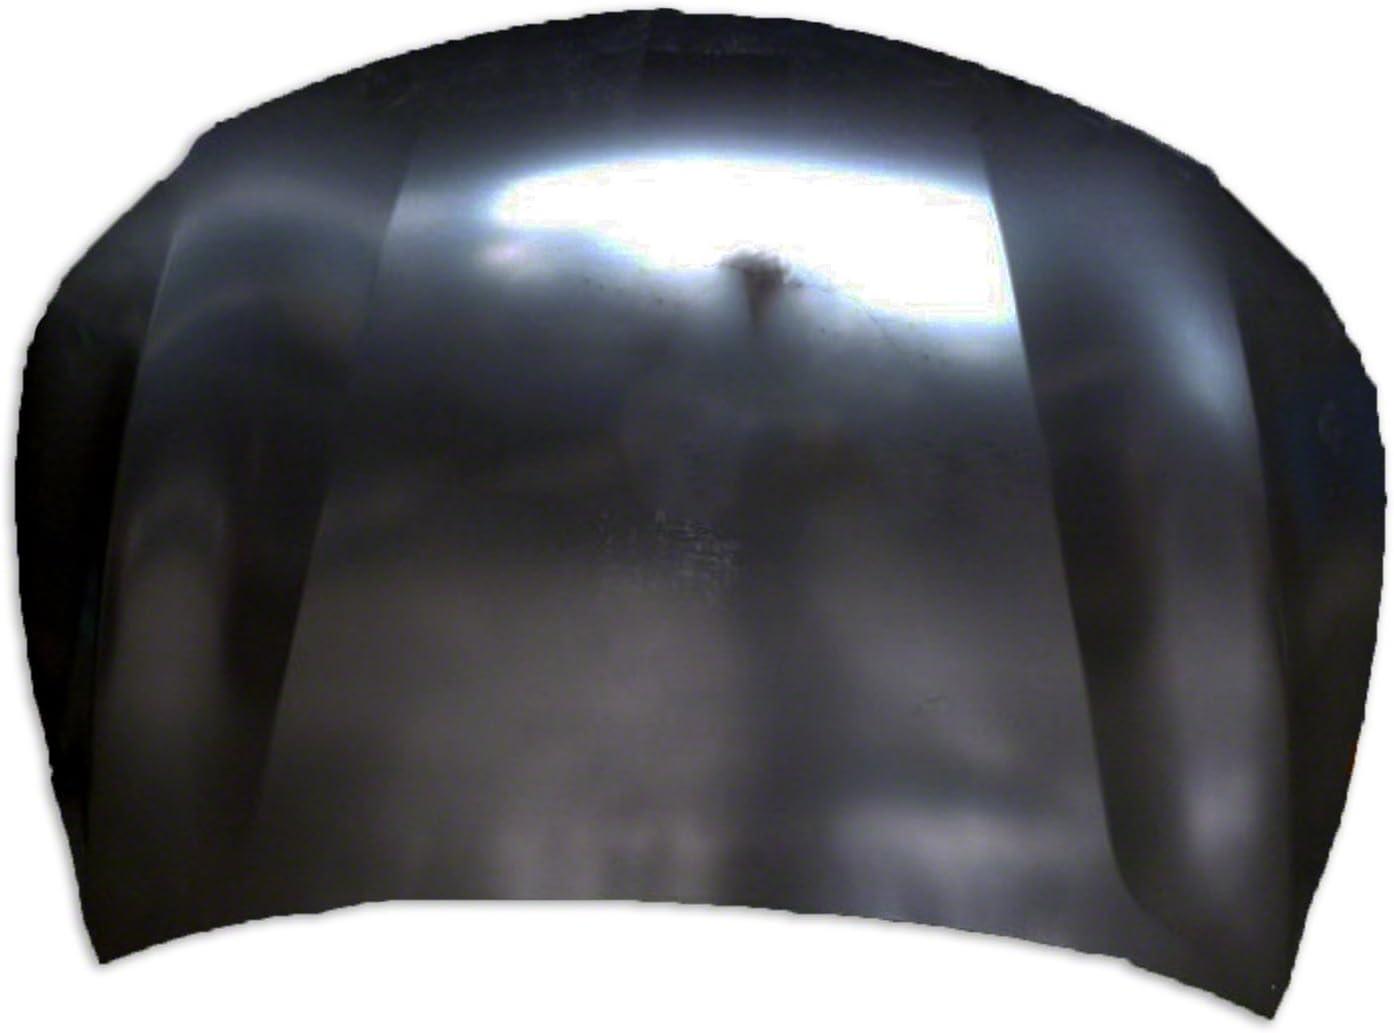 CPP Steel Primed Hood for 2013-2015 Honda Civic